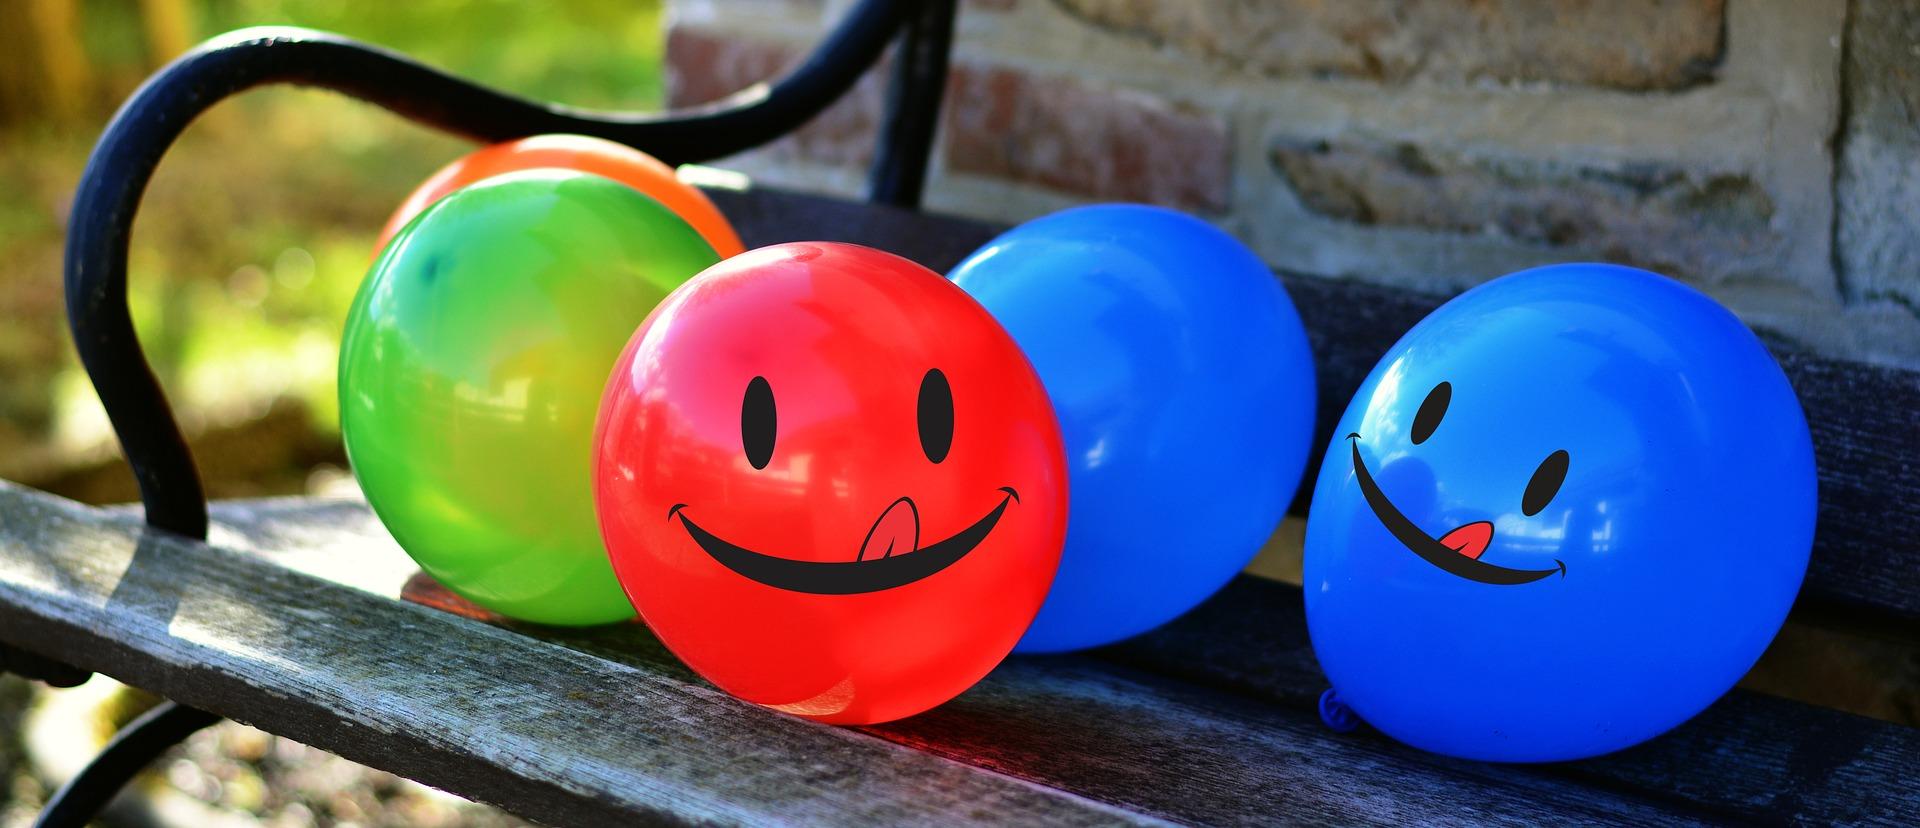 balloons-3159417_1920.jpg